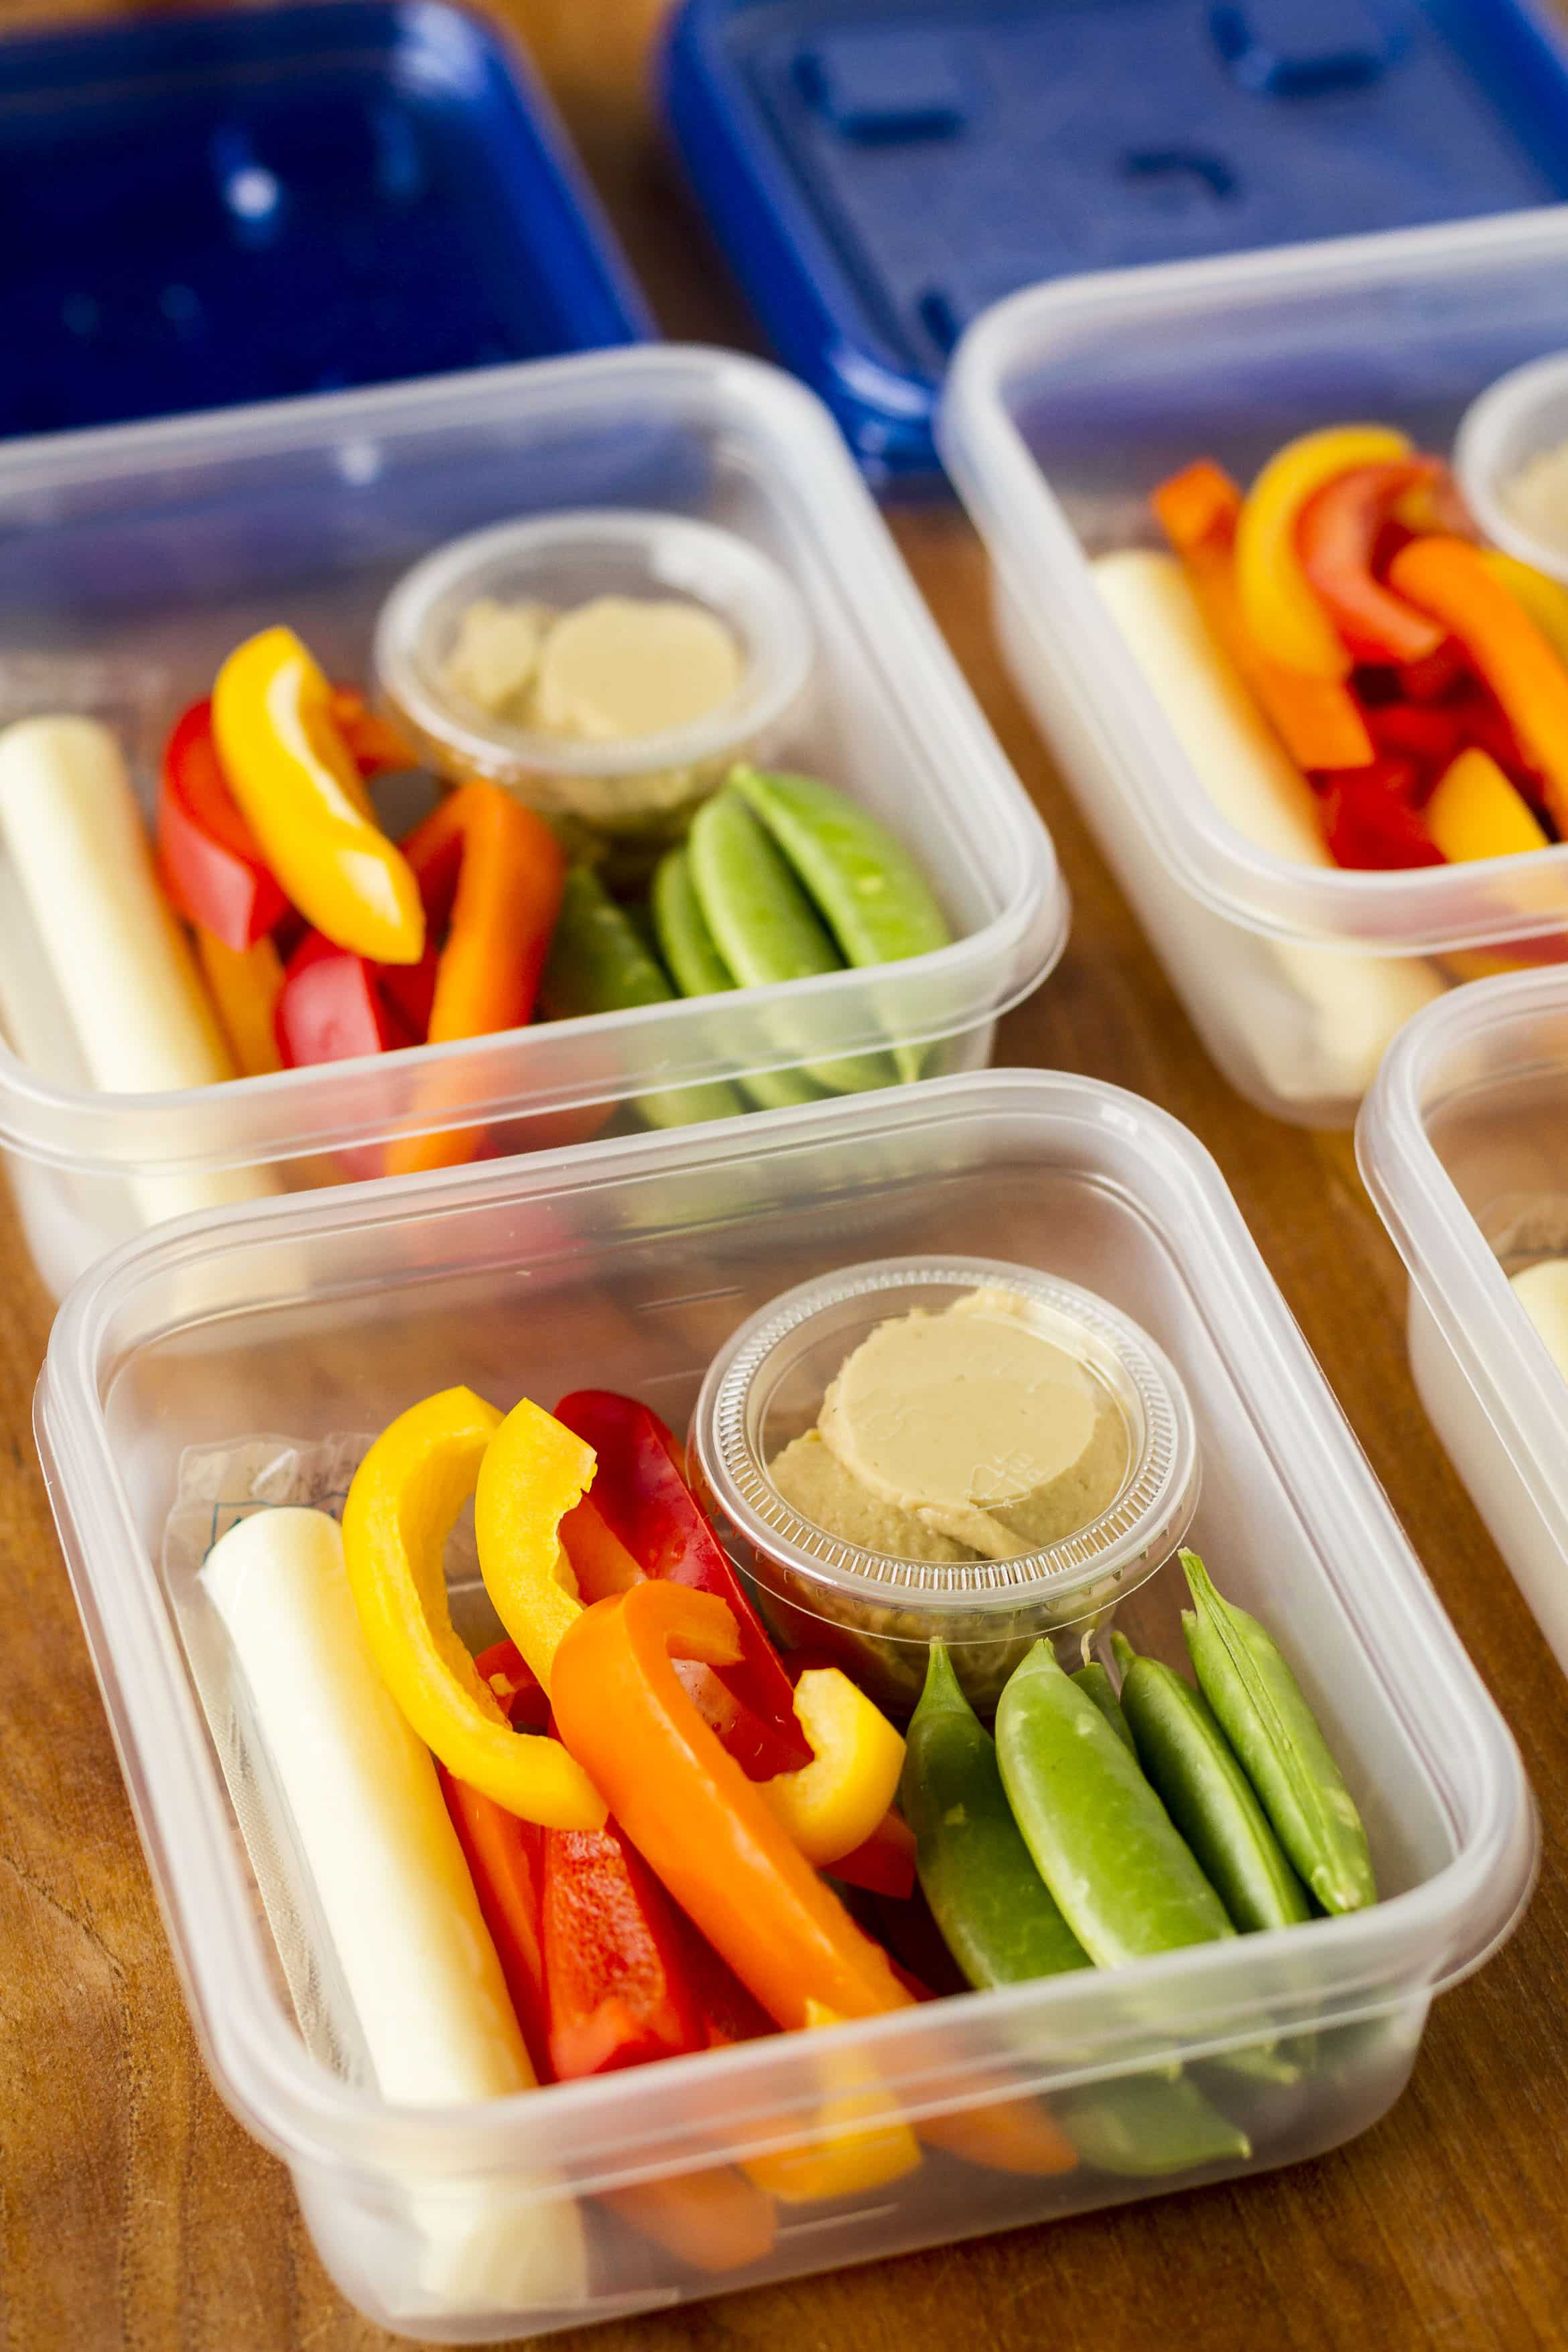 Hummus Snack Idea | Veggies & Hummus Snack Box ...